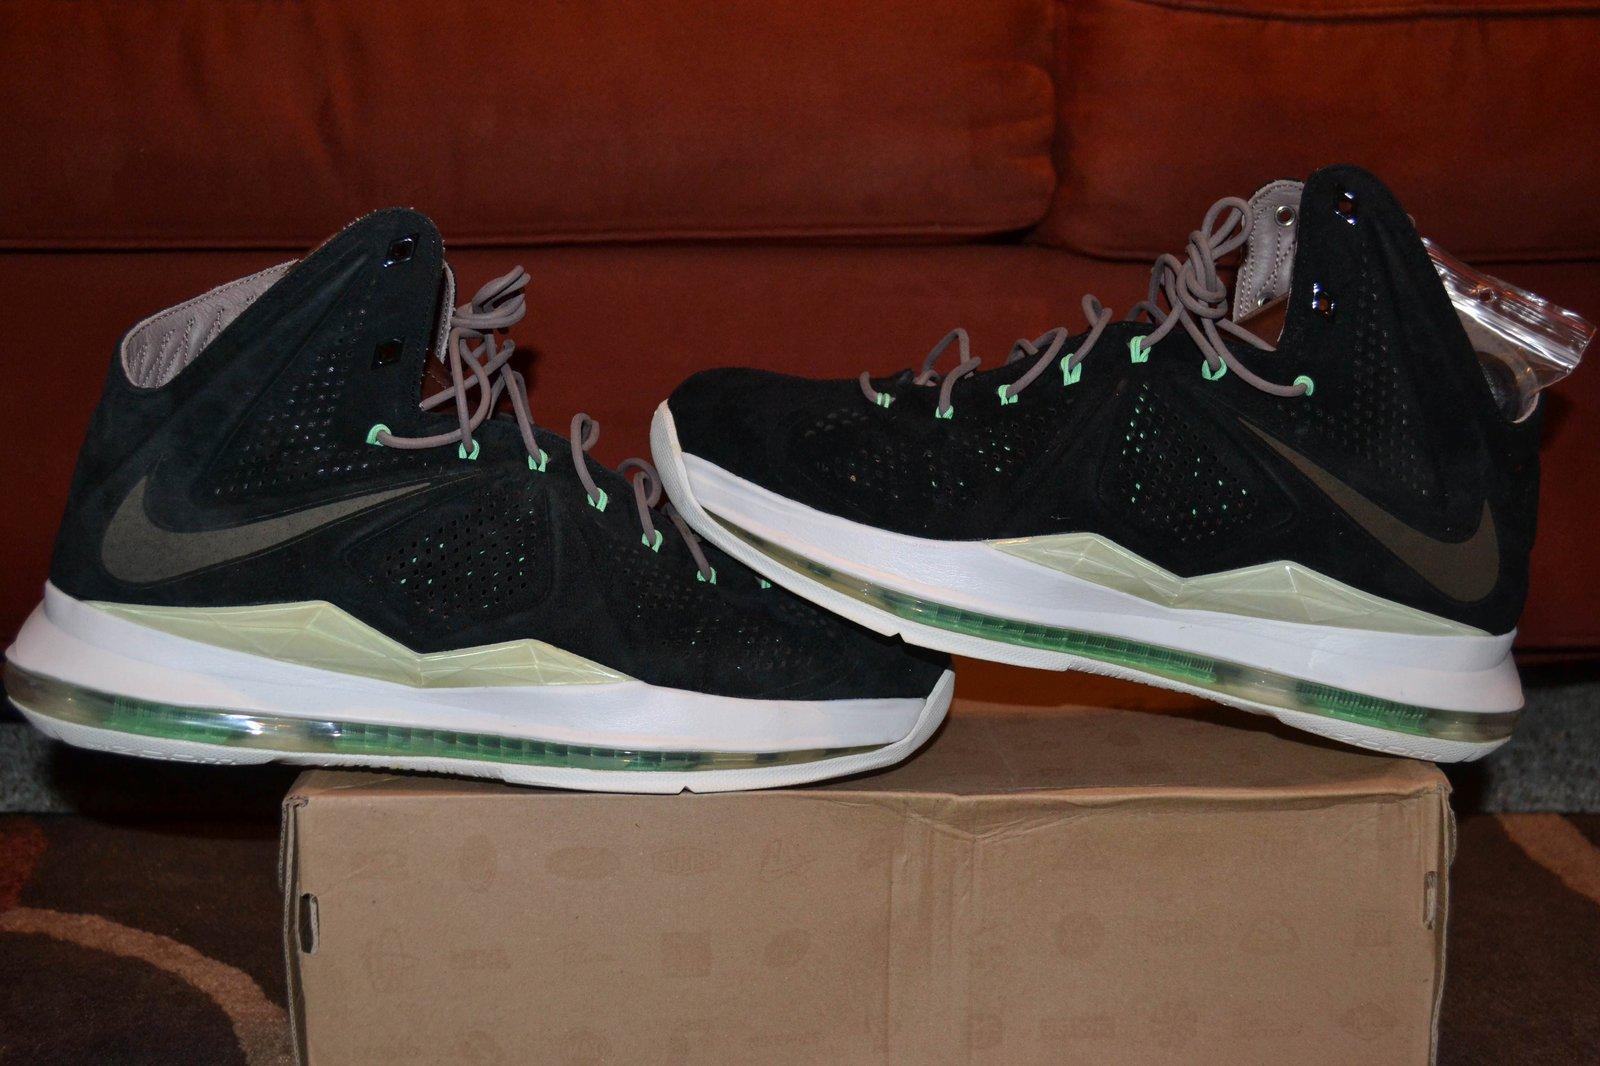 Nike Lebron 10 EXT QS: BLACK SUEDE